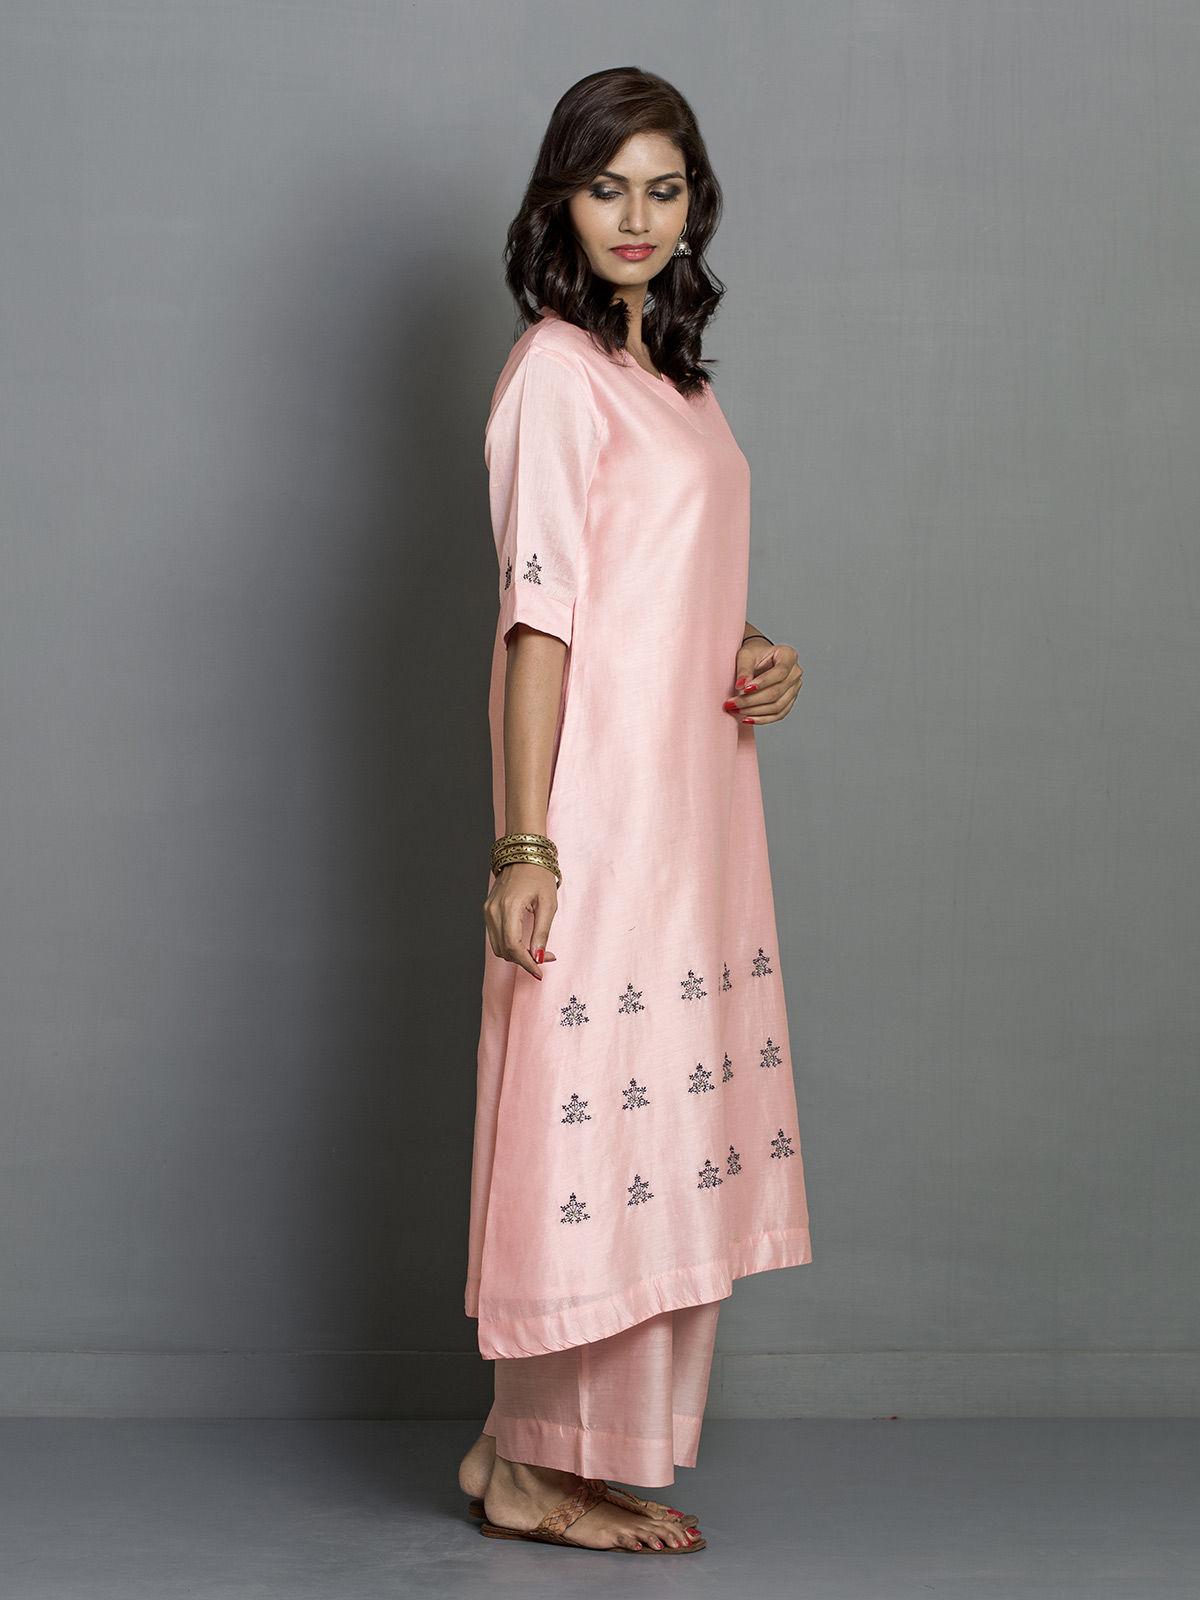 Peach A-line Flared Chanderi Kurta with Embroidered Motifs